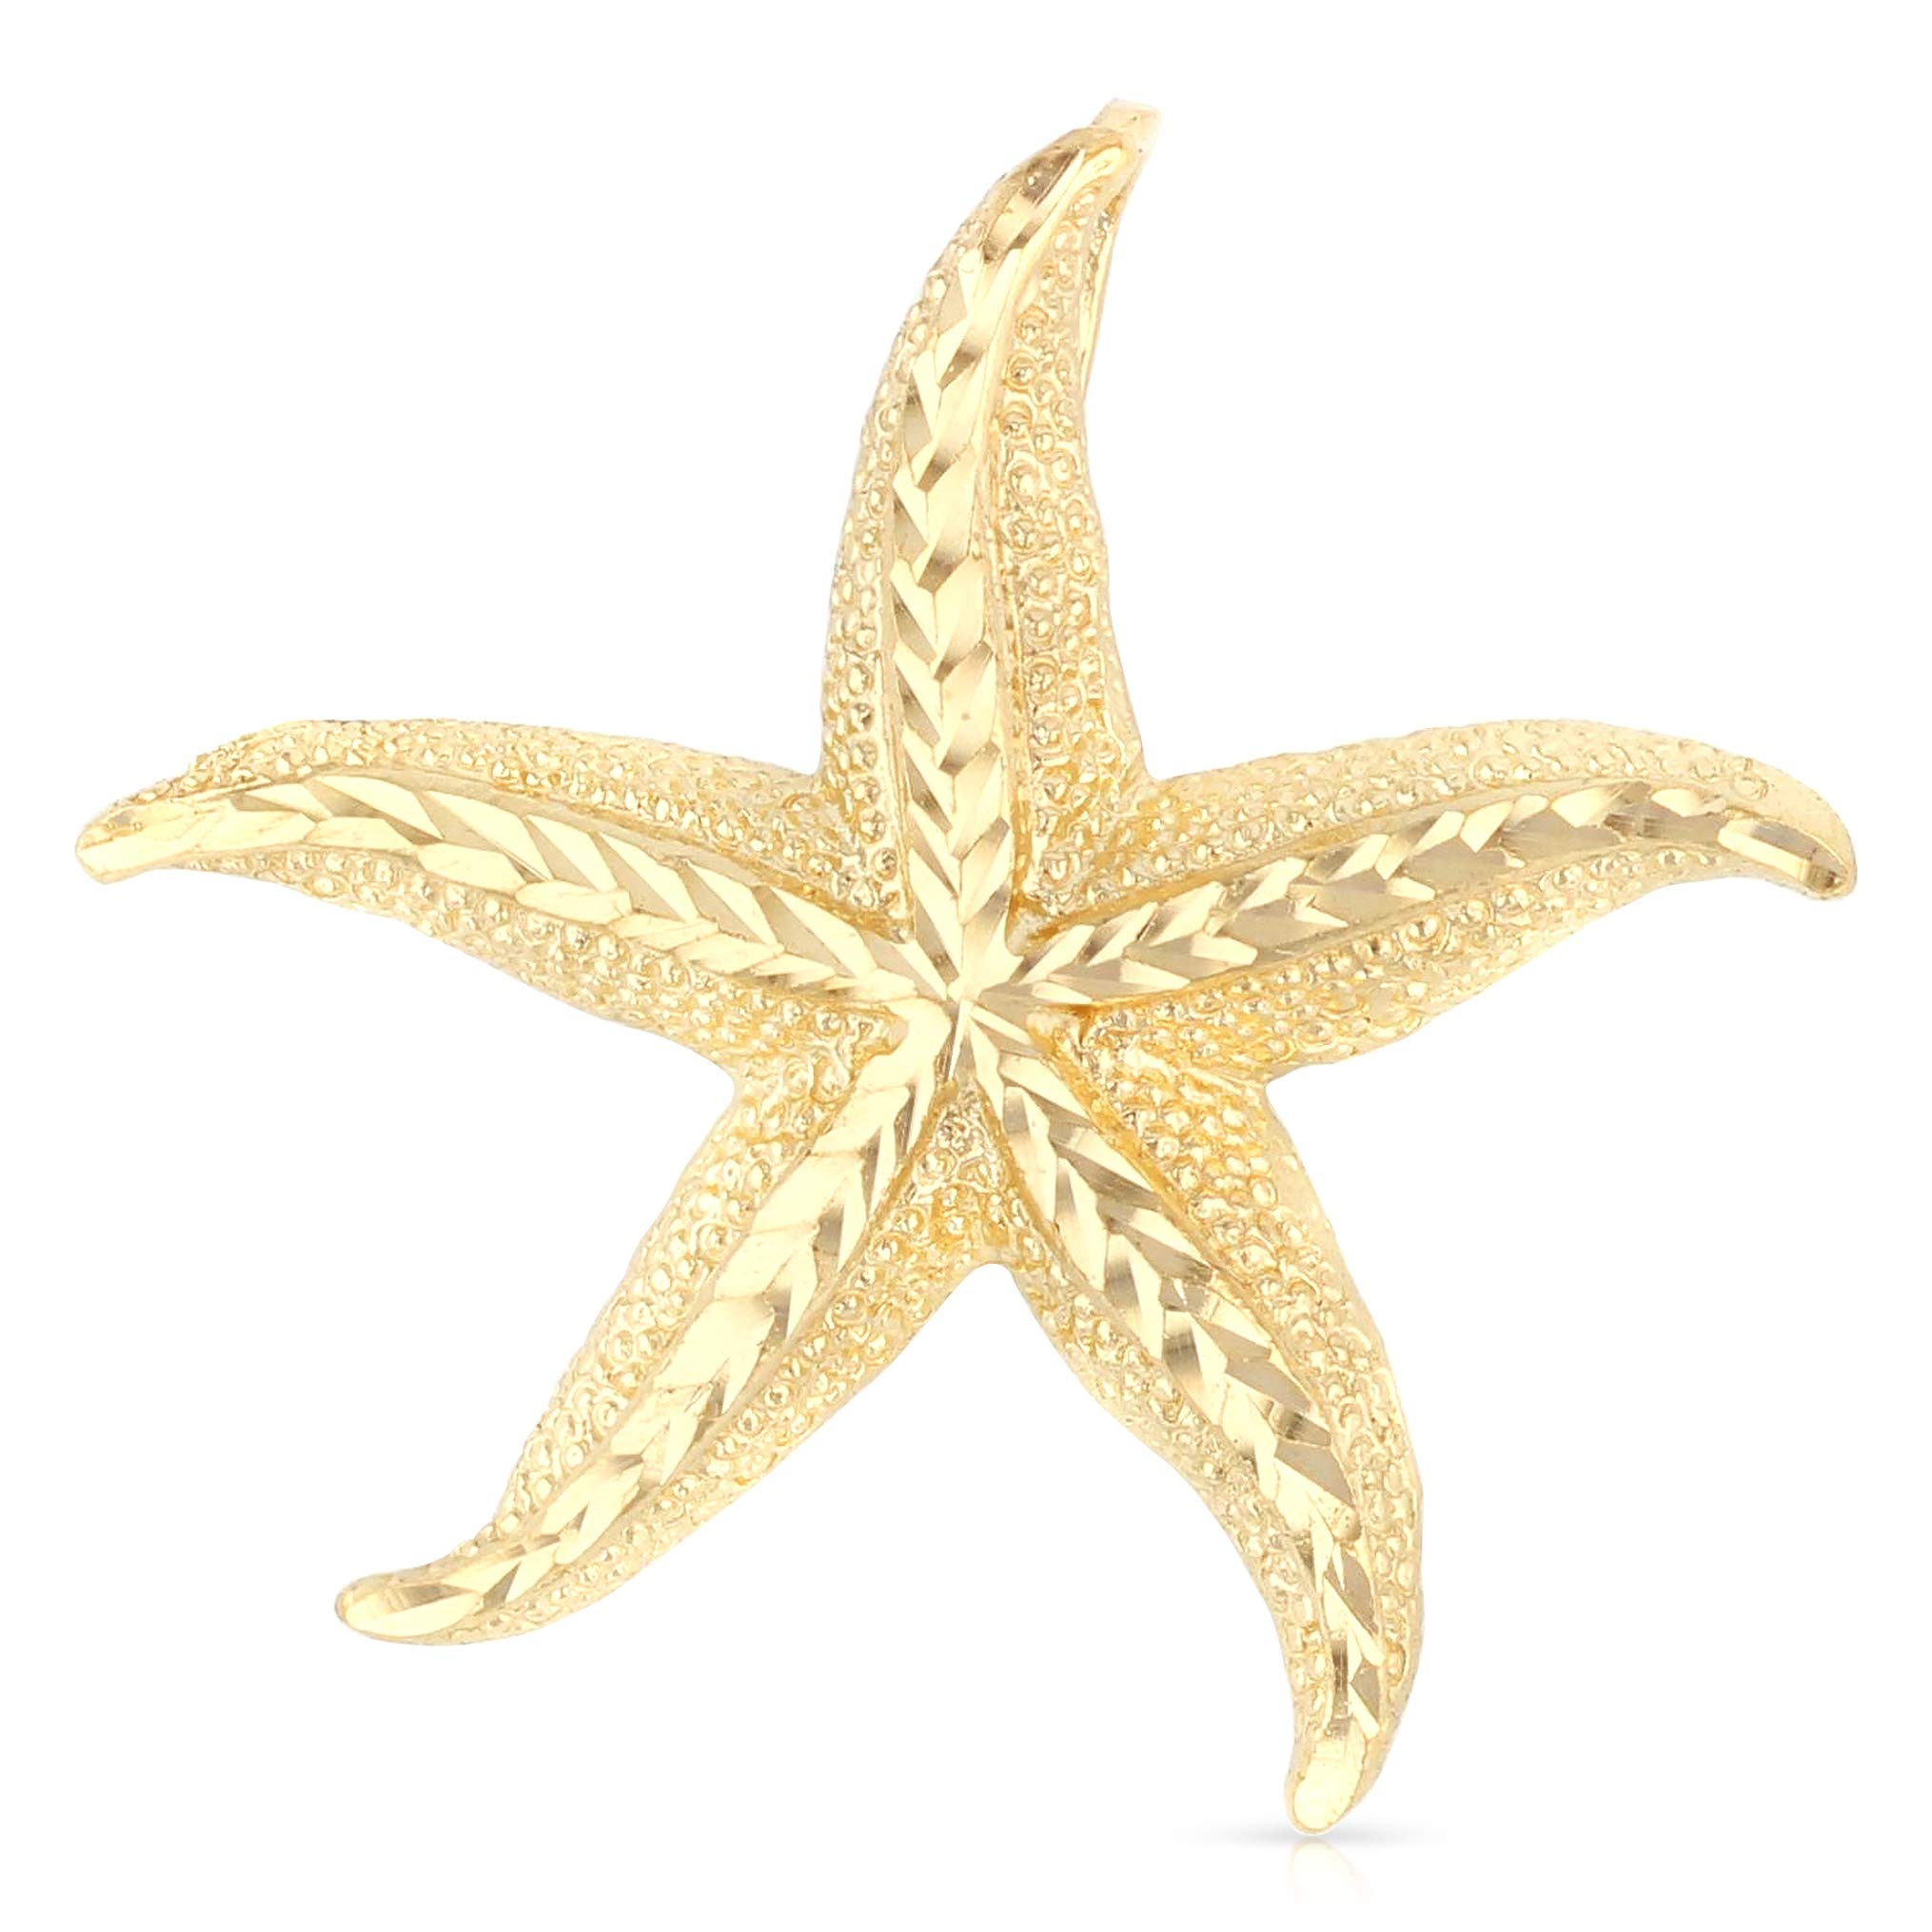 Ioka - 14K Yellow Gold Starfish Charm Pendant For Necklace or Chain by Ioka